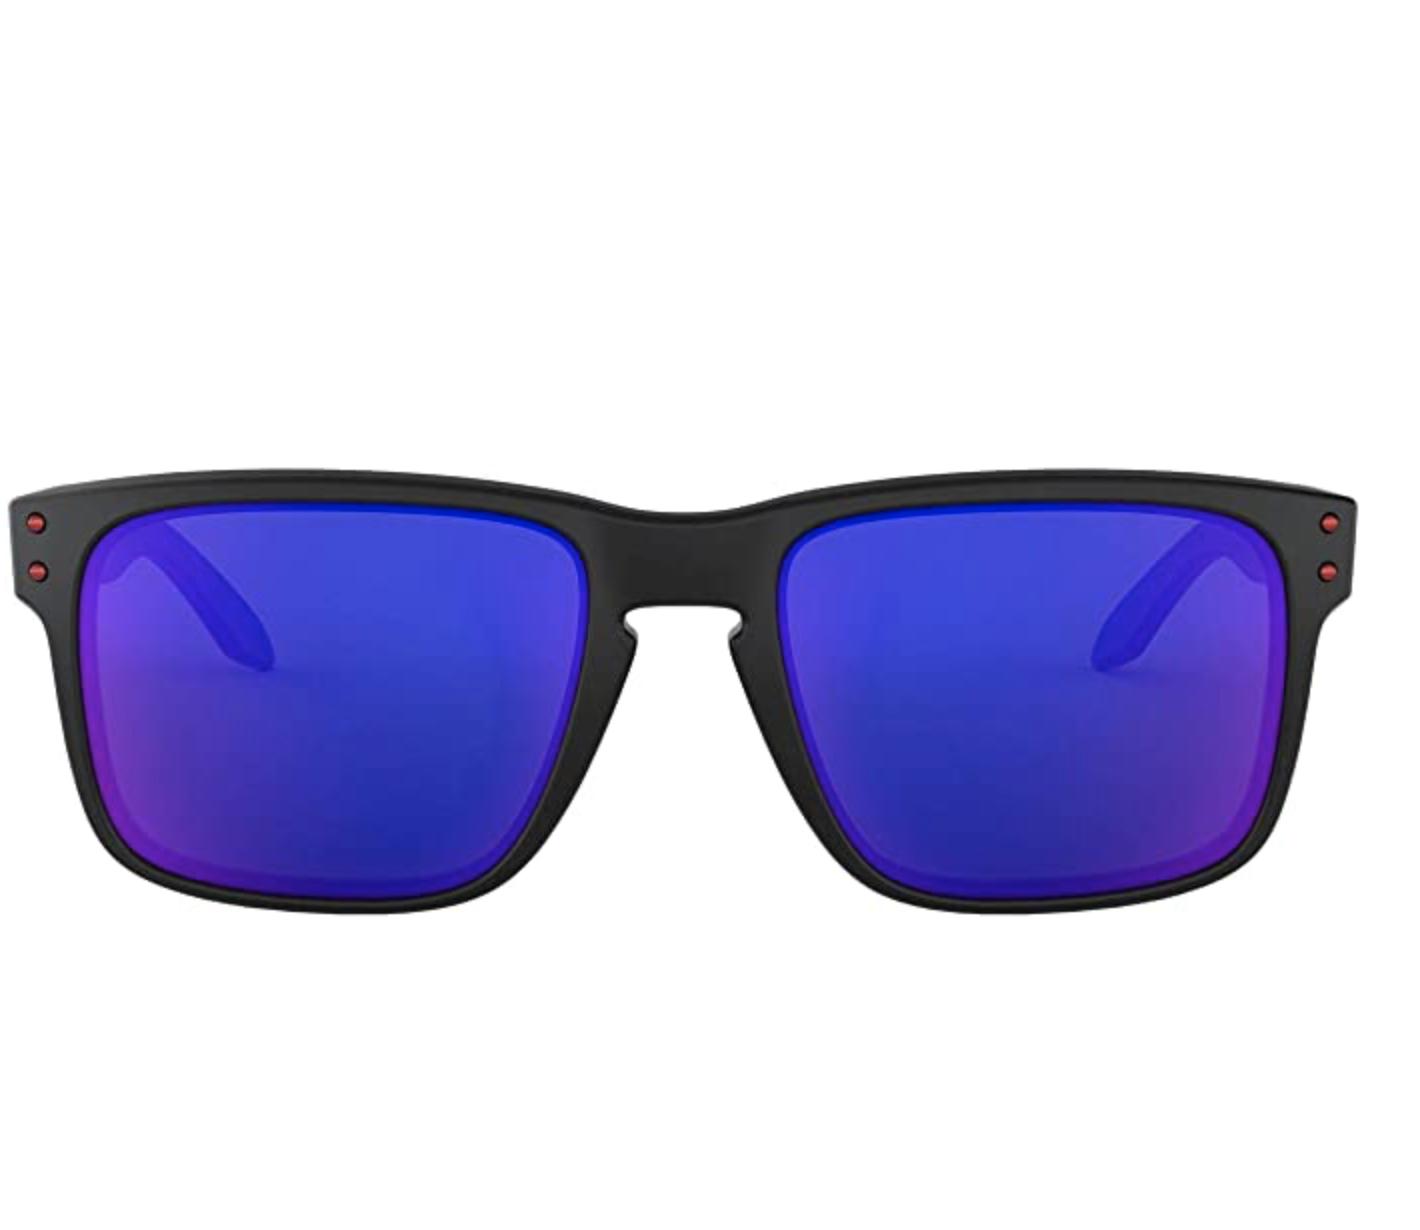 Oakley Men's Oo9102 Holbrook Sunglasses